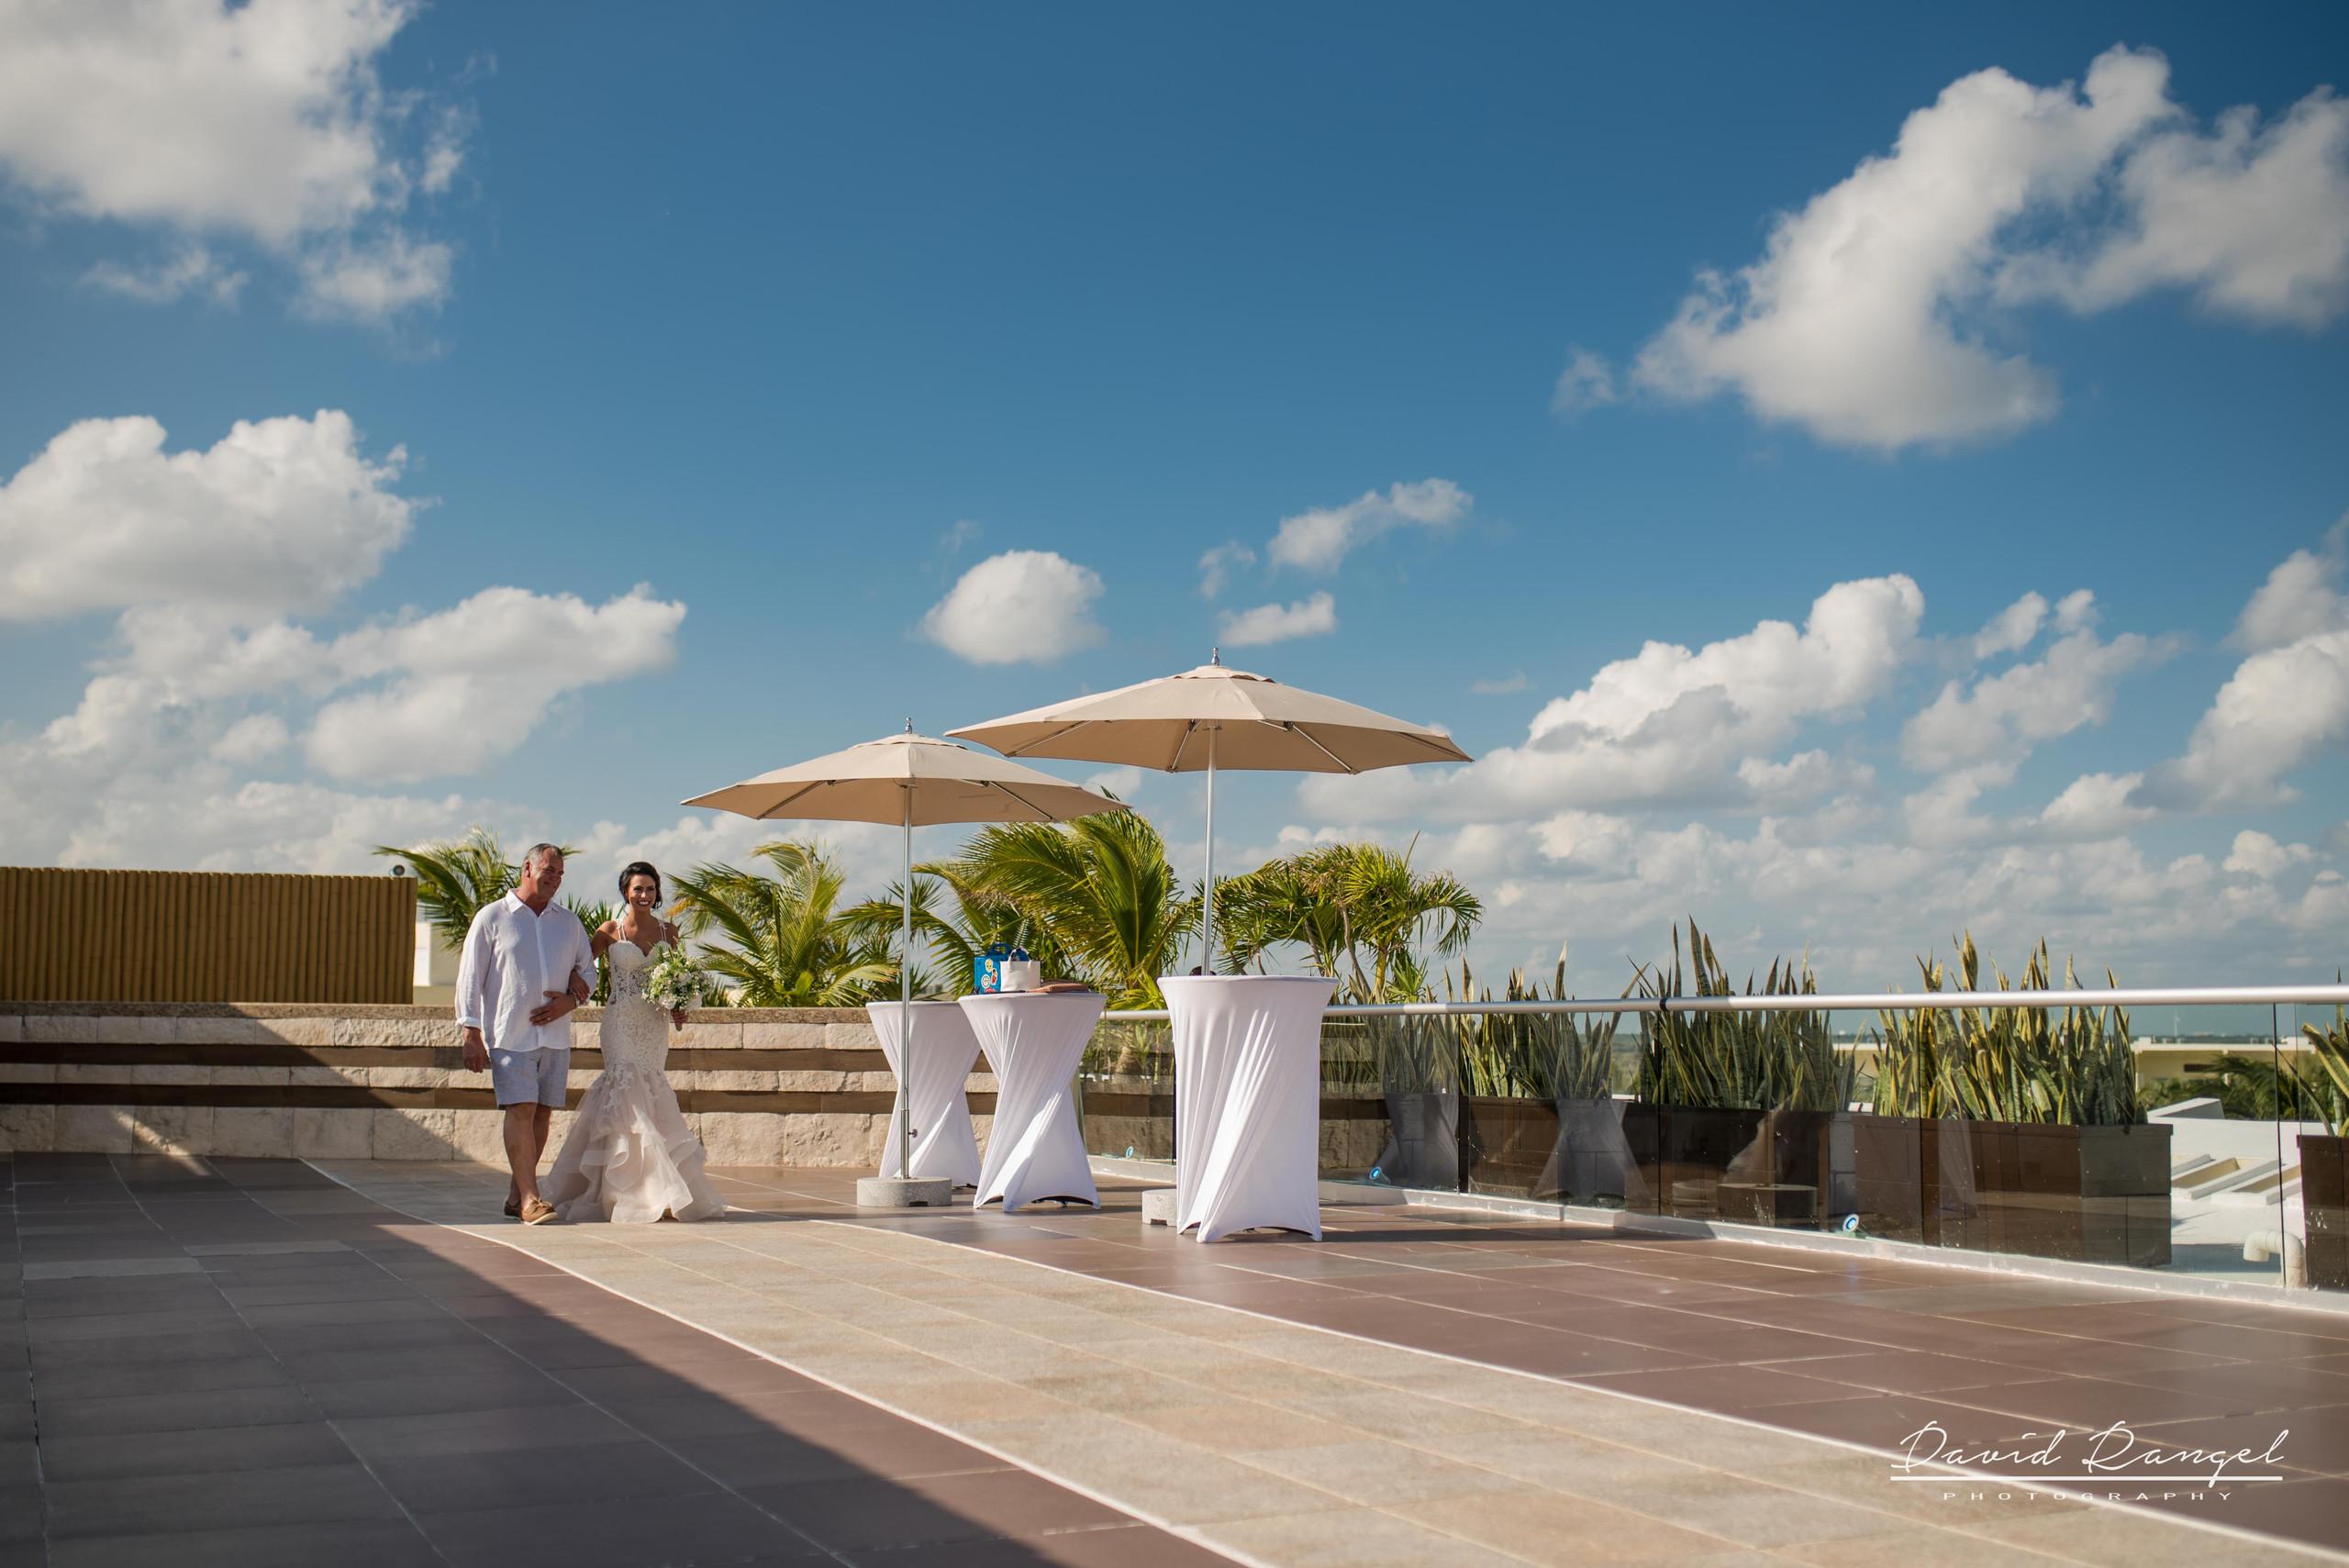 bride+walk+aisle+sky+deck+terrace